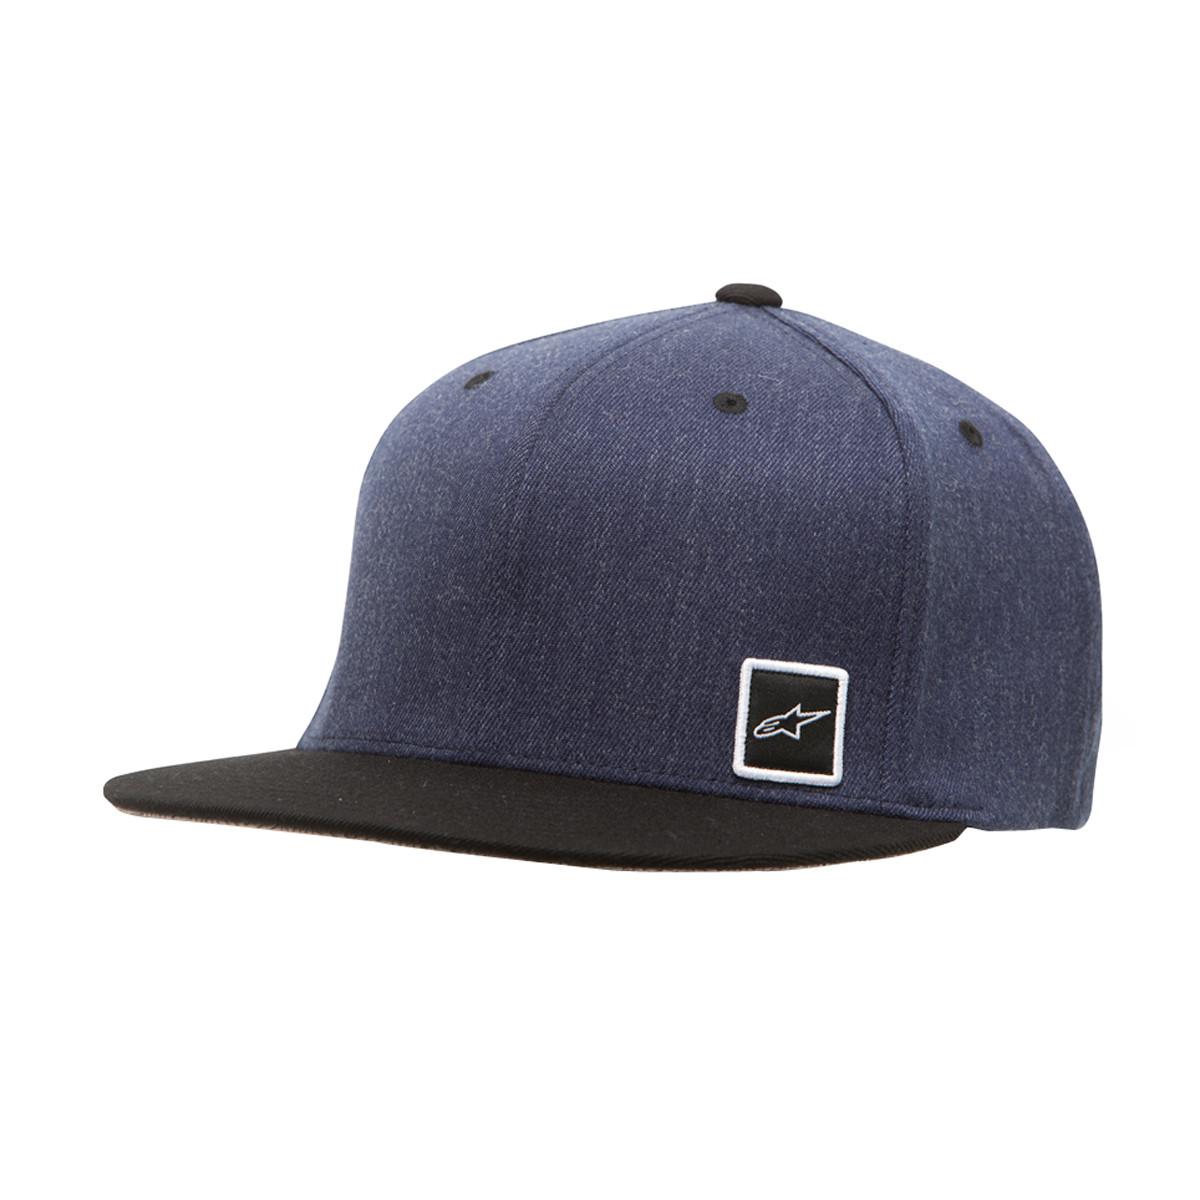 8579432cdb4 Alpinestars Descent Mens Flex Back Hat - Perf-Moto